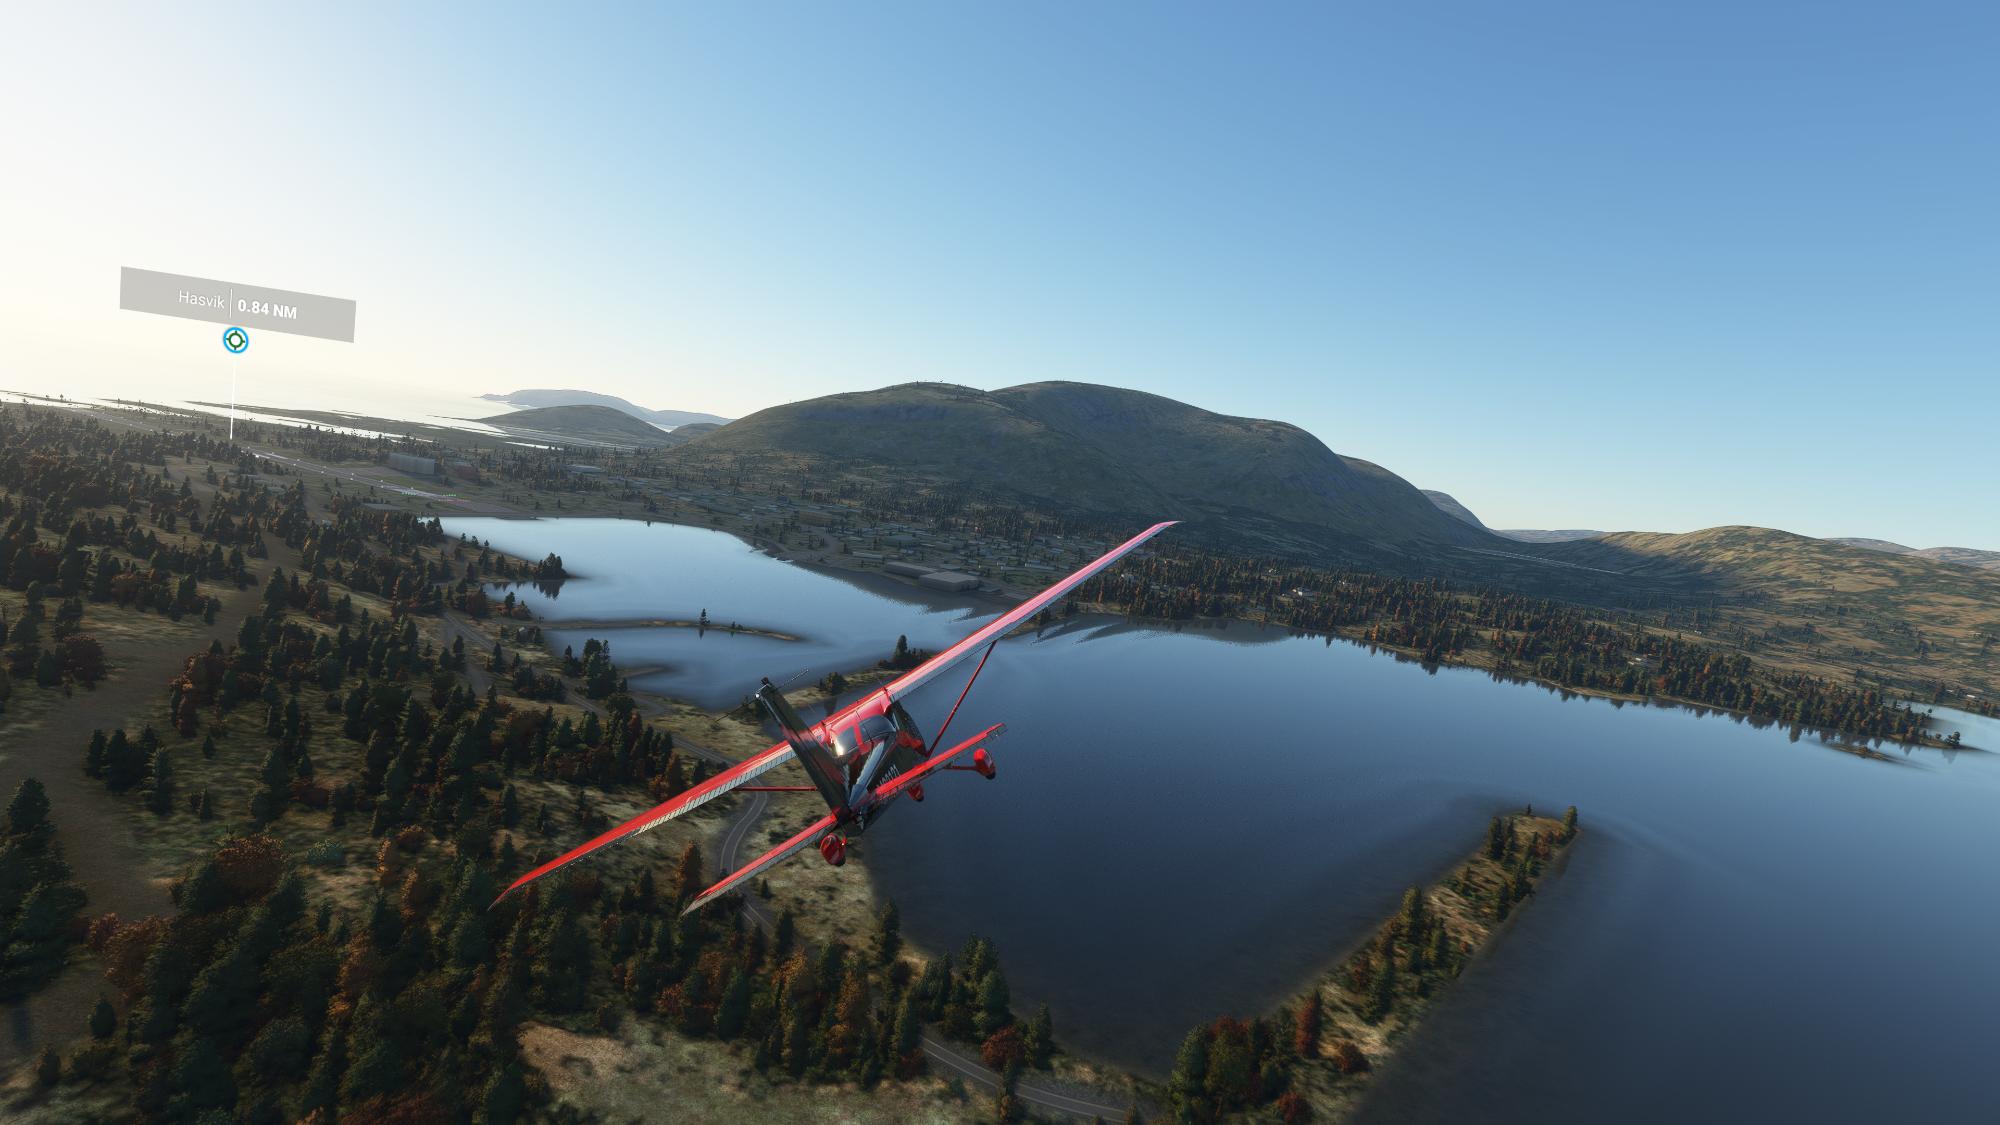 Microsoft Flight Simulator - 1.10.11.0 21.11.2020 20_45_53.png